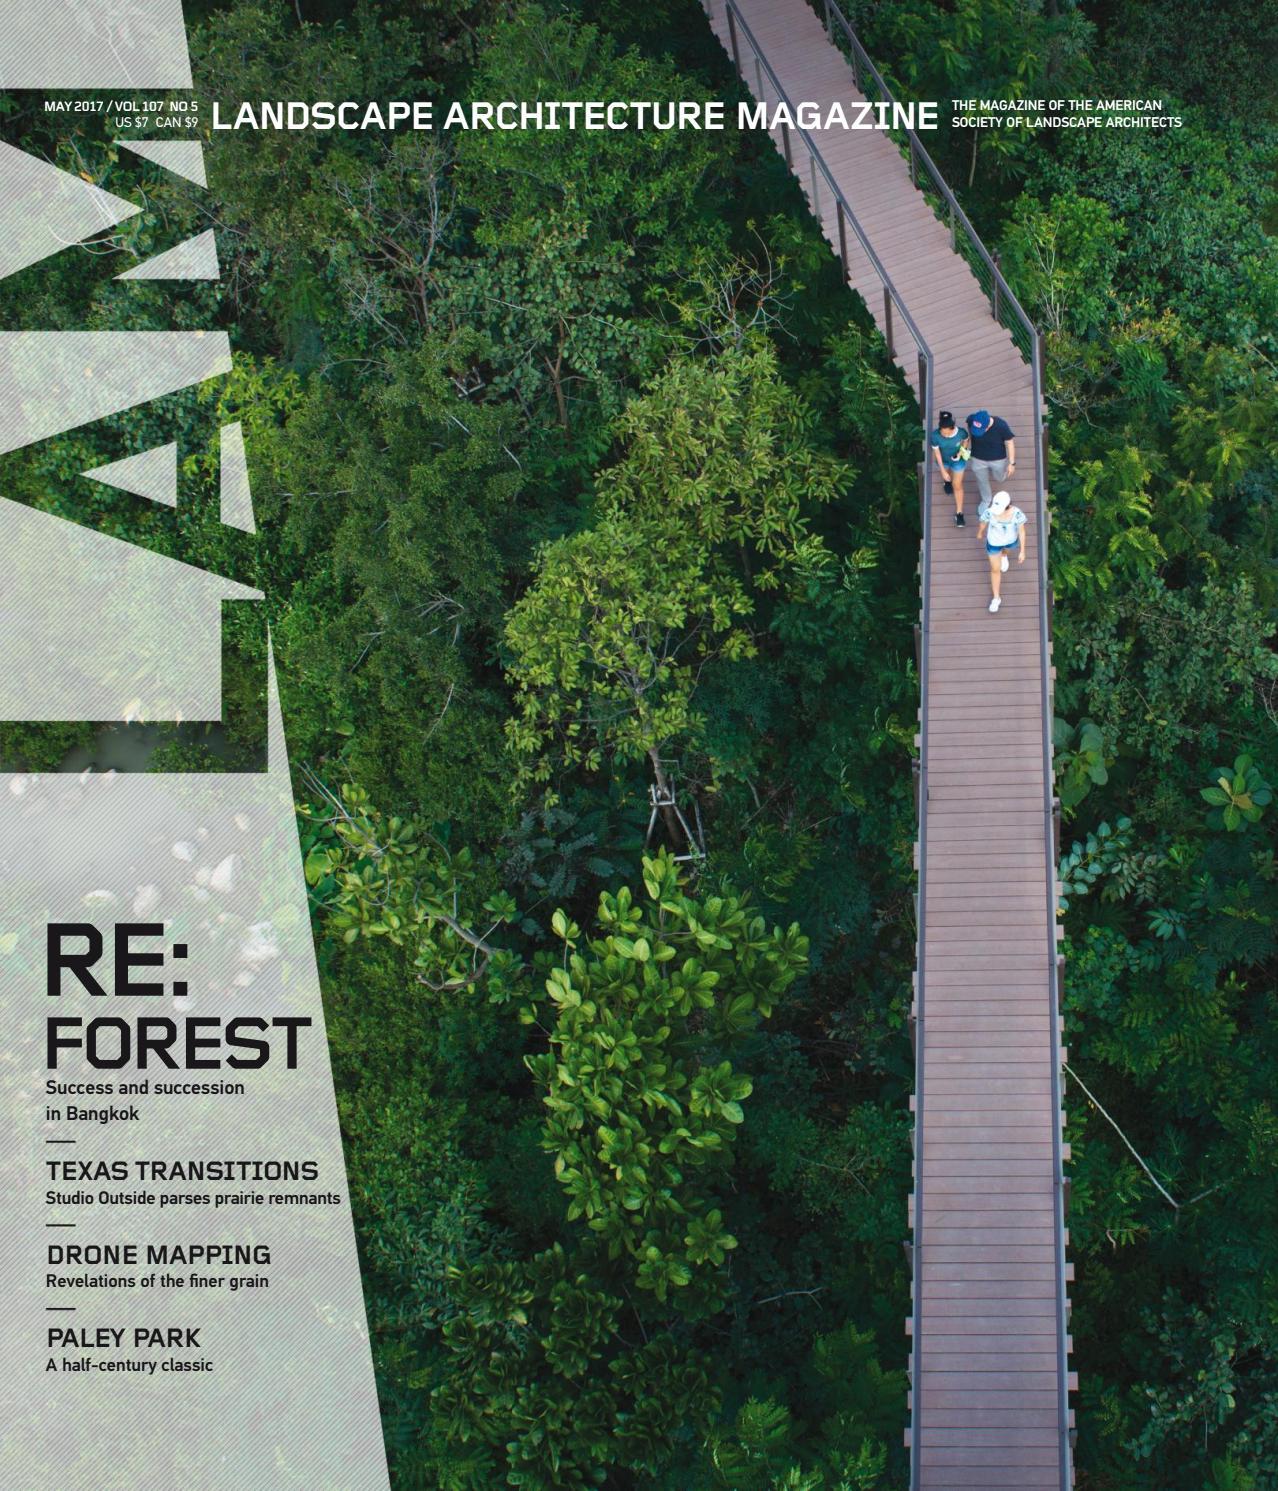 Landscape Architecture Magazine LAM-2017-may by KiếnTrúc • Online